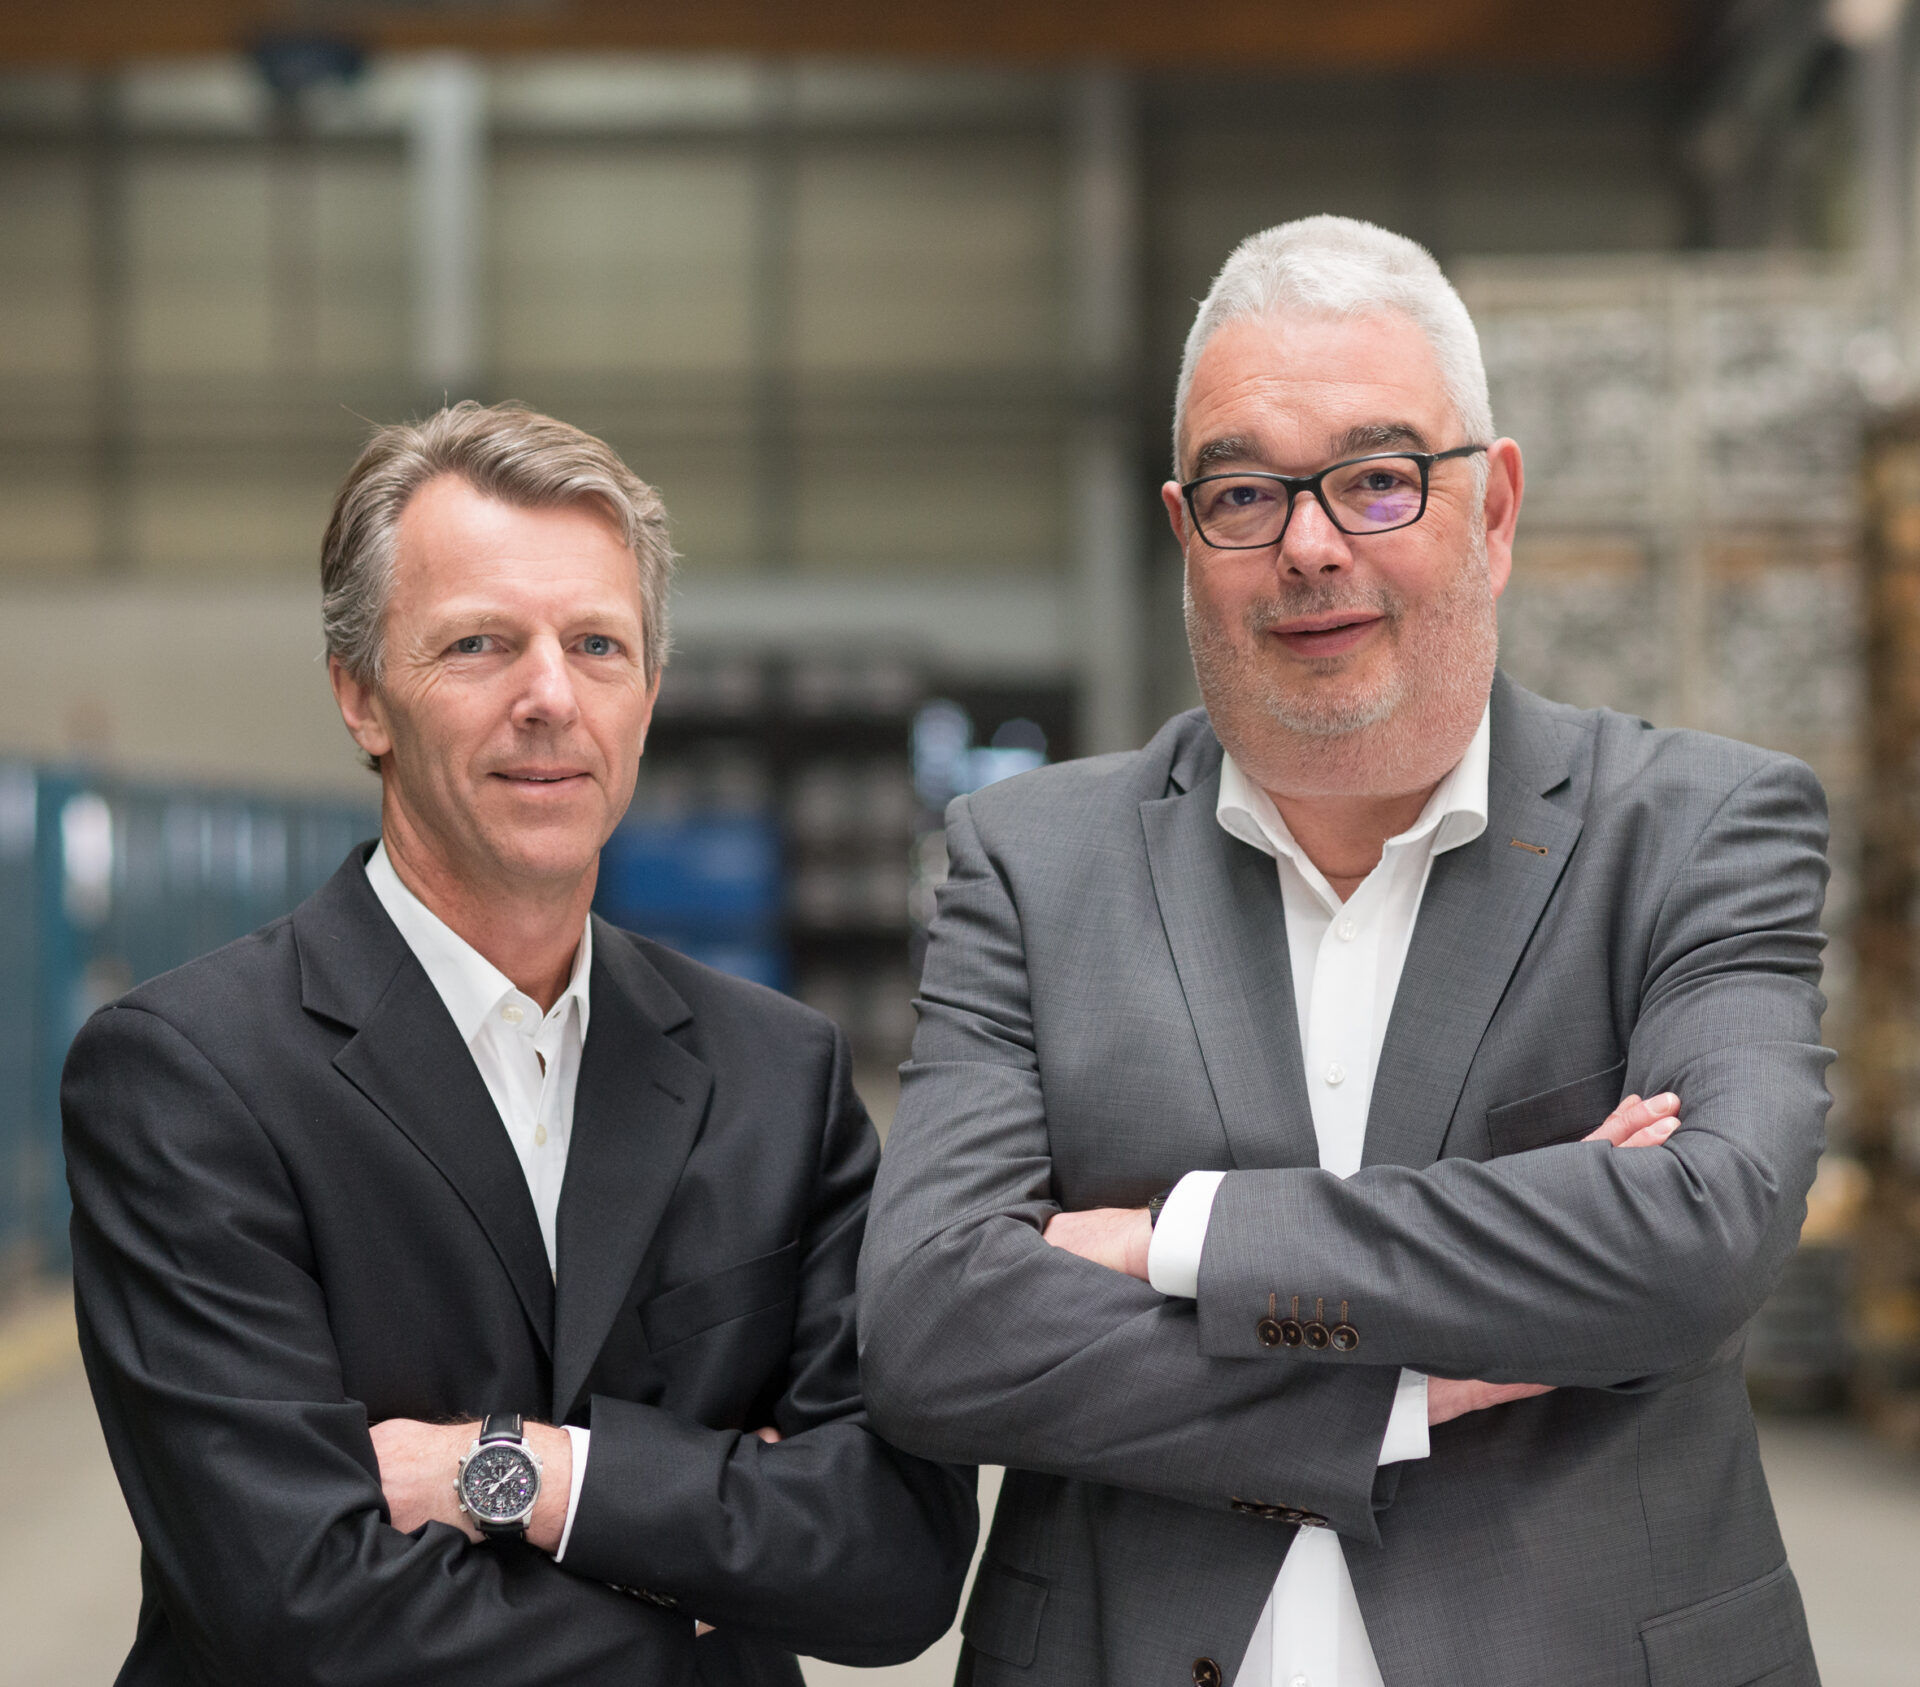 Newalu-Geschäftsführer Stefan Matthaei und Martin Volpers.